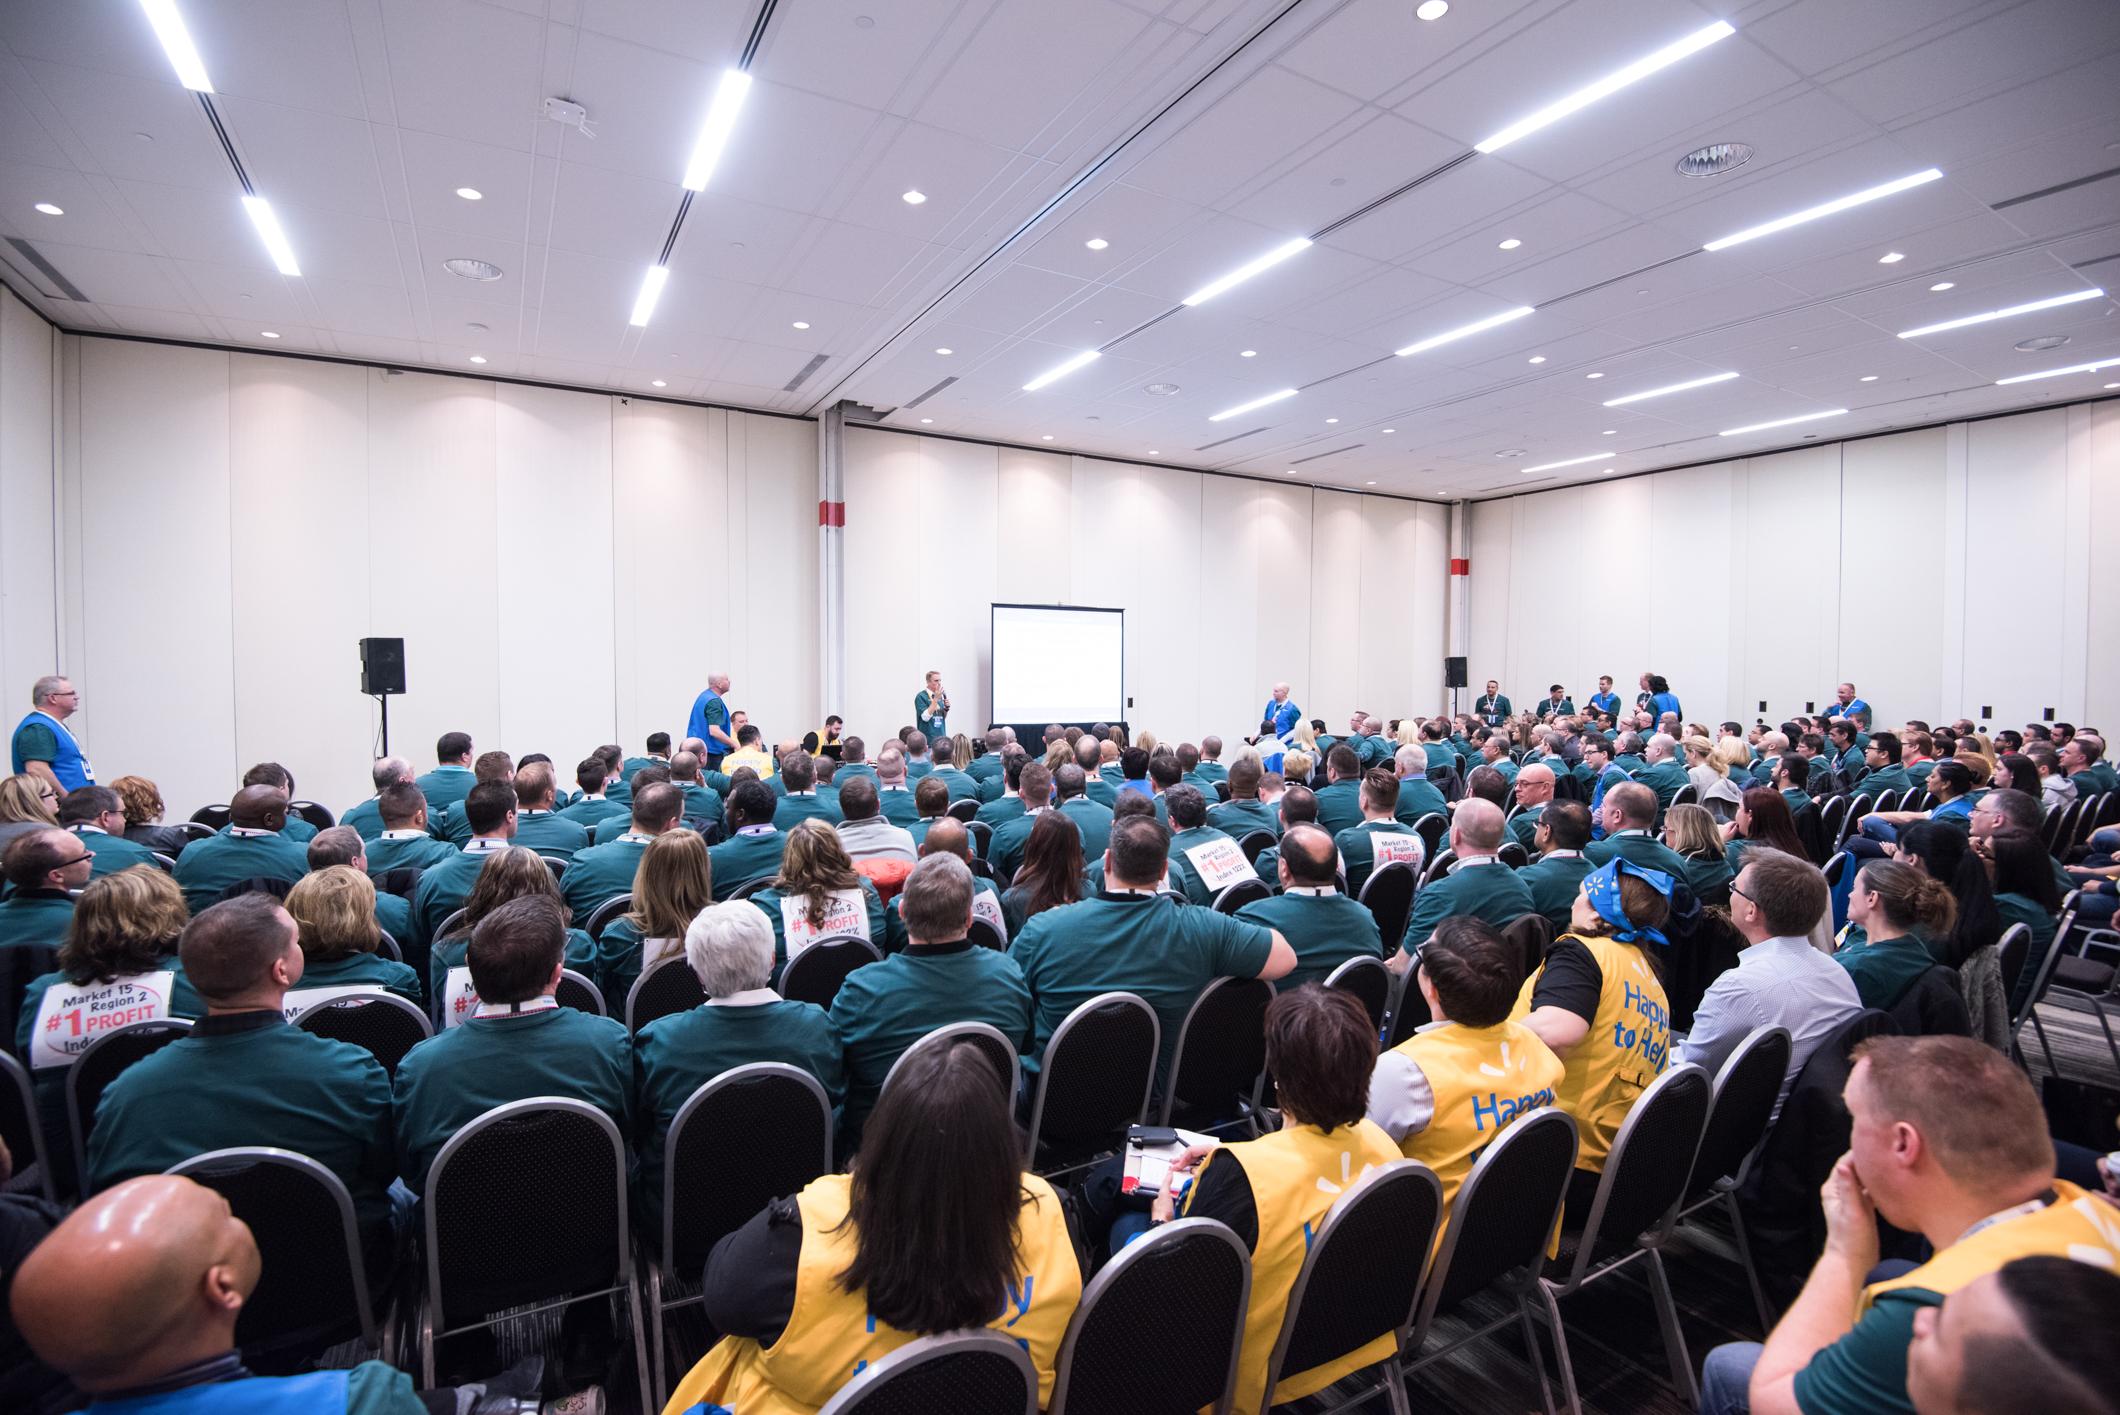 Uptown Media Toronto Event Photographer _ Conference Photography _ Corporate event photography _ Confernce Photographer_-17.jpg